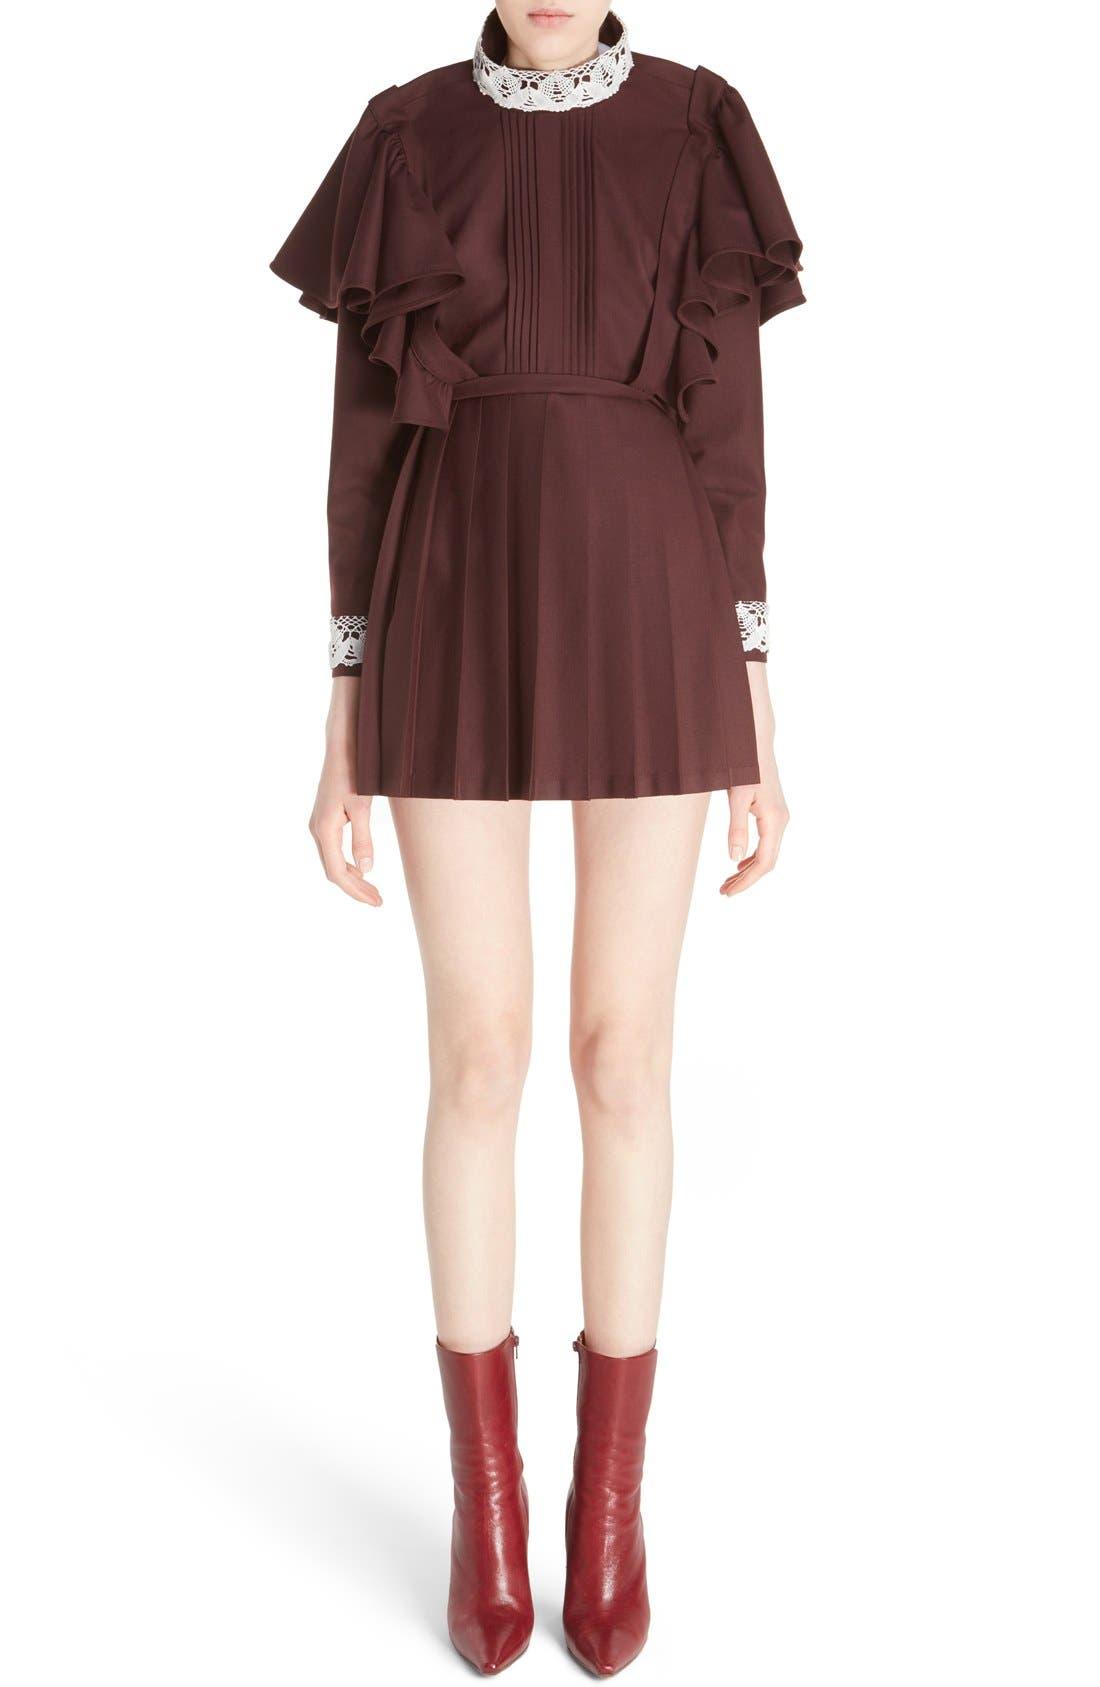 Alternate Image 1 Selected - Vetements 'Schoolgirl' Lace Trim Minidress